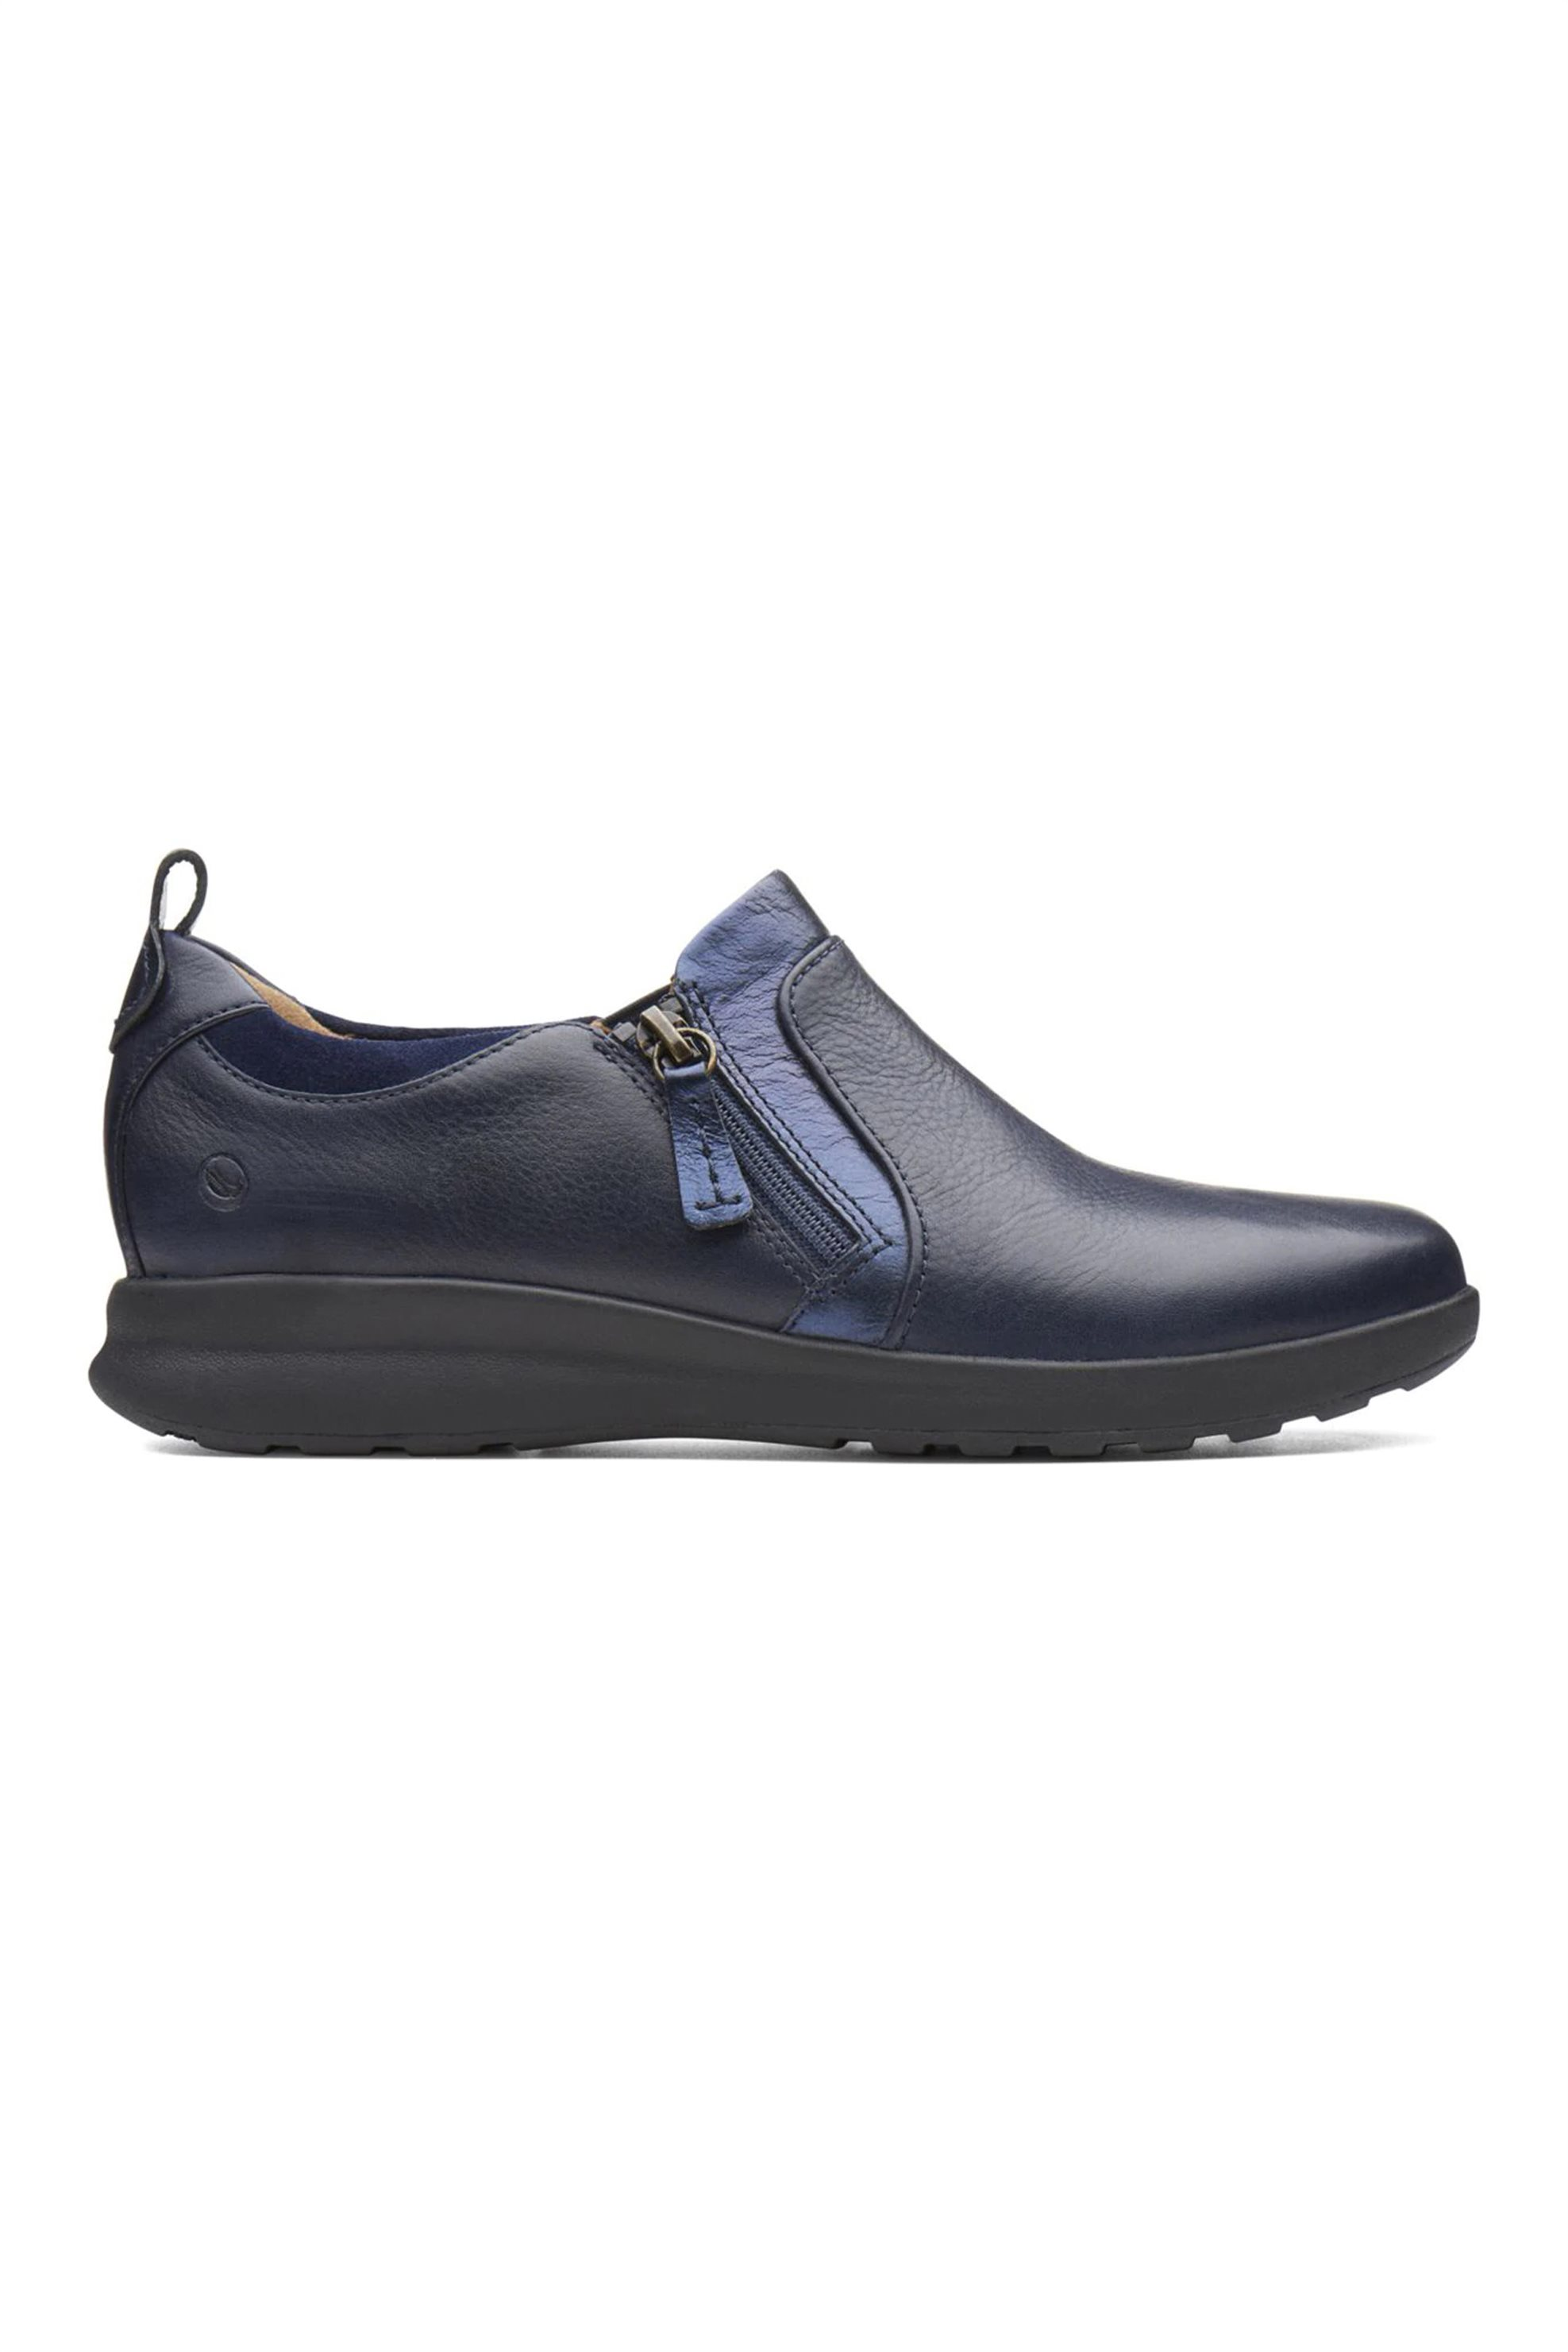 Clarks γυναικεία παπούτσια δίχρωμα «Un Adorn Zip» – 26138355 – Μπλε Σκούρο